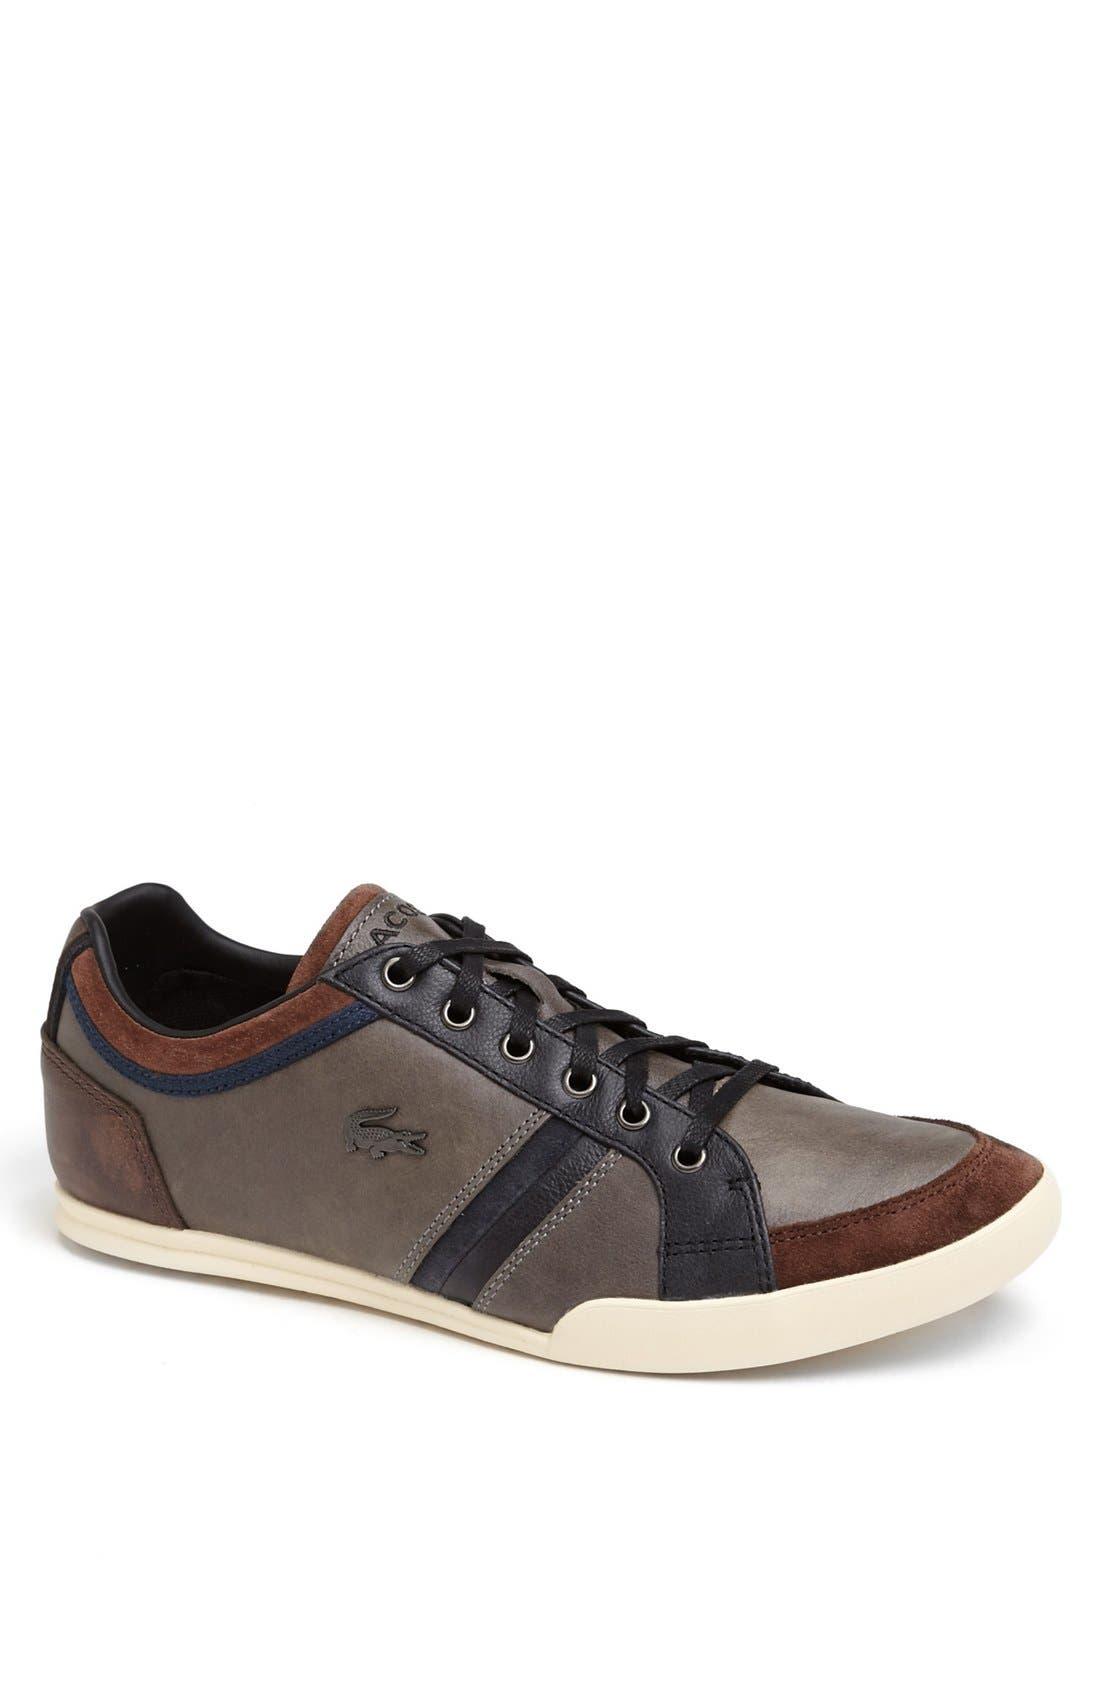 Main Image - Lacoste 'Rayford 3' Sneaker (Men)